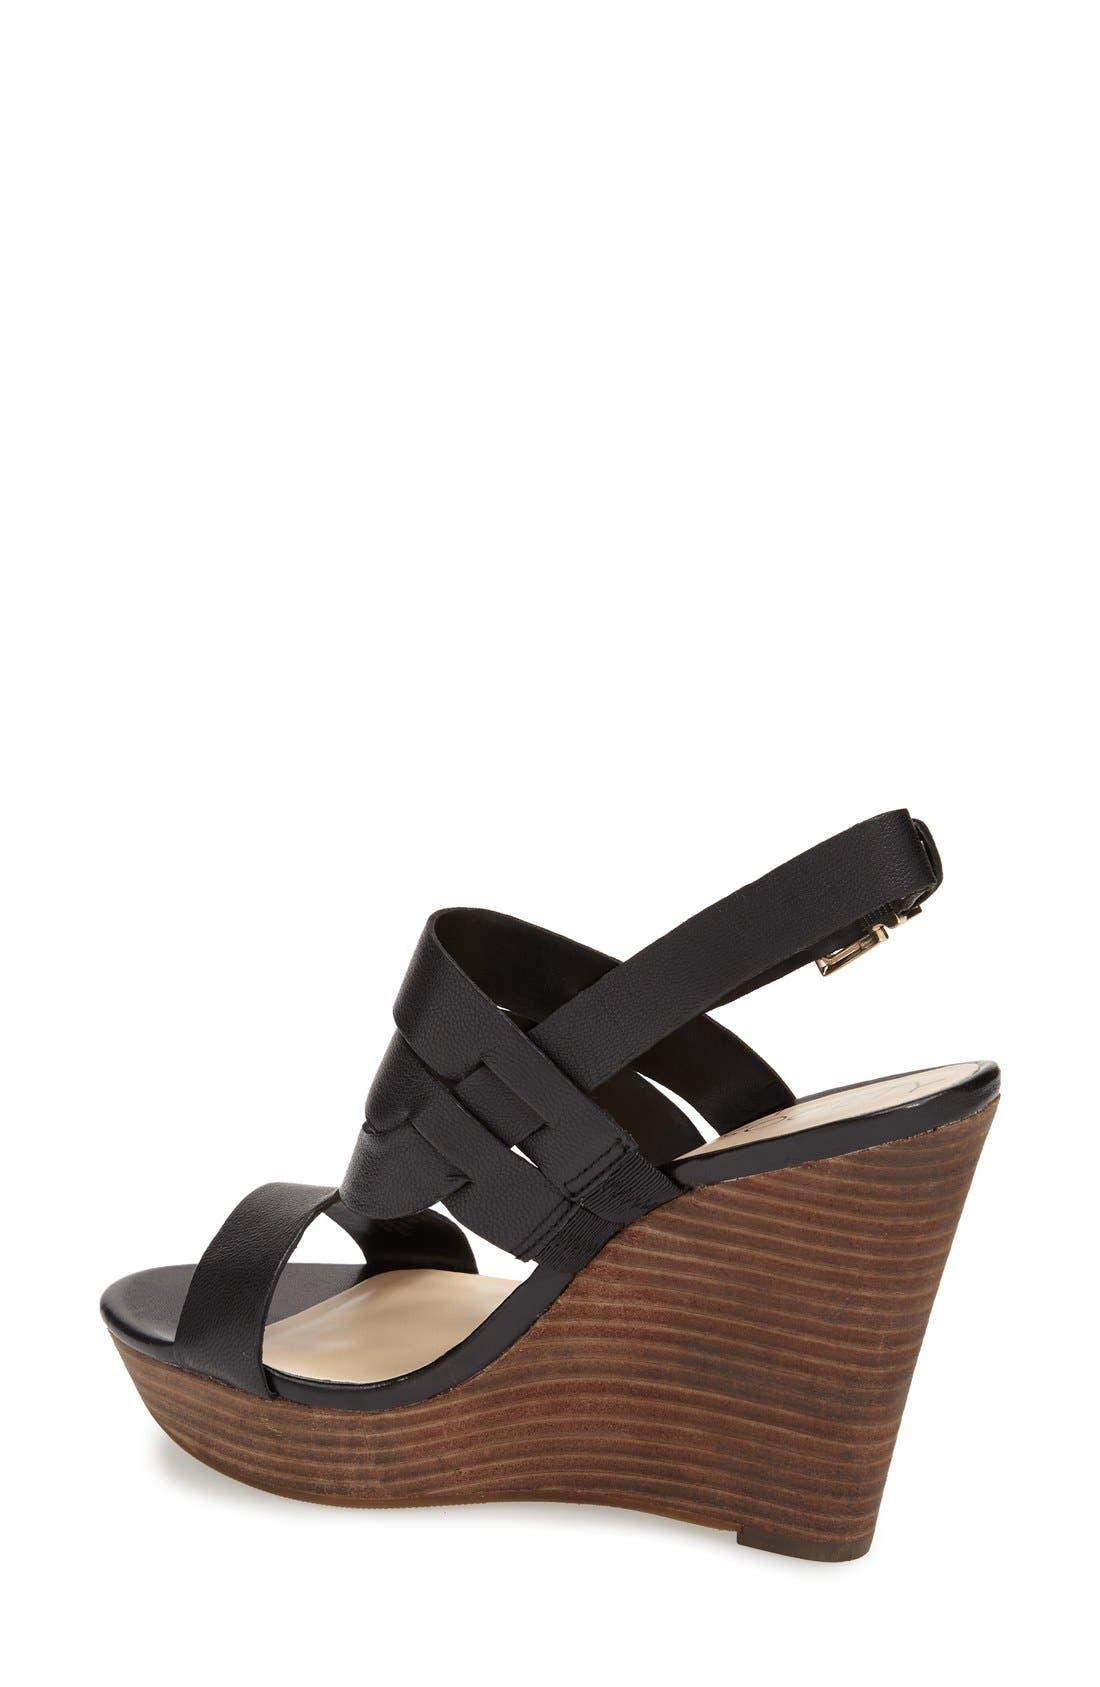 SOLE SOCIETY,                             'Jenny' Slingback Wedge Sandal,                             Alternate thumbnail 2, color,                             001